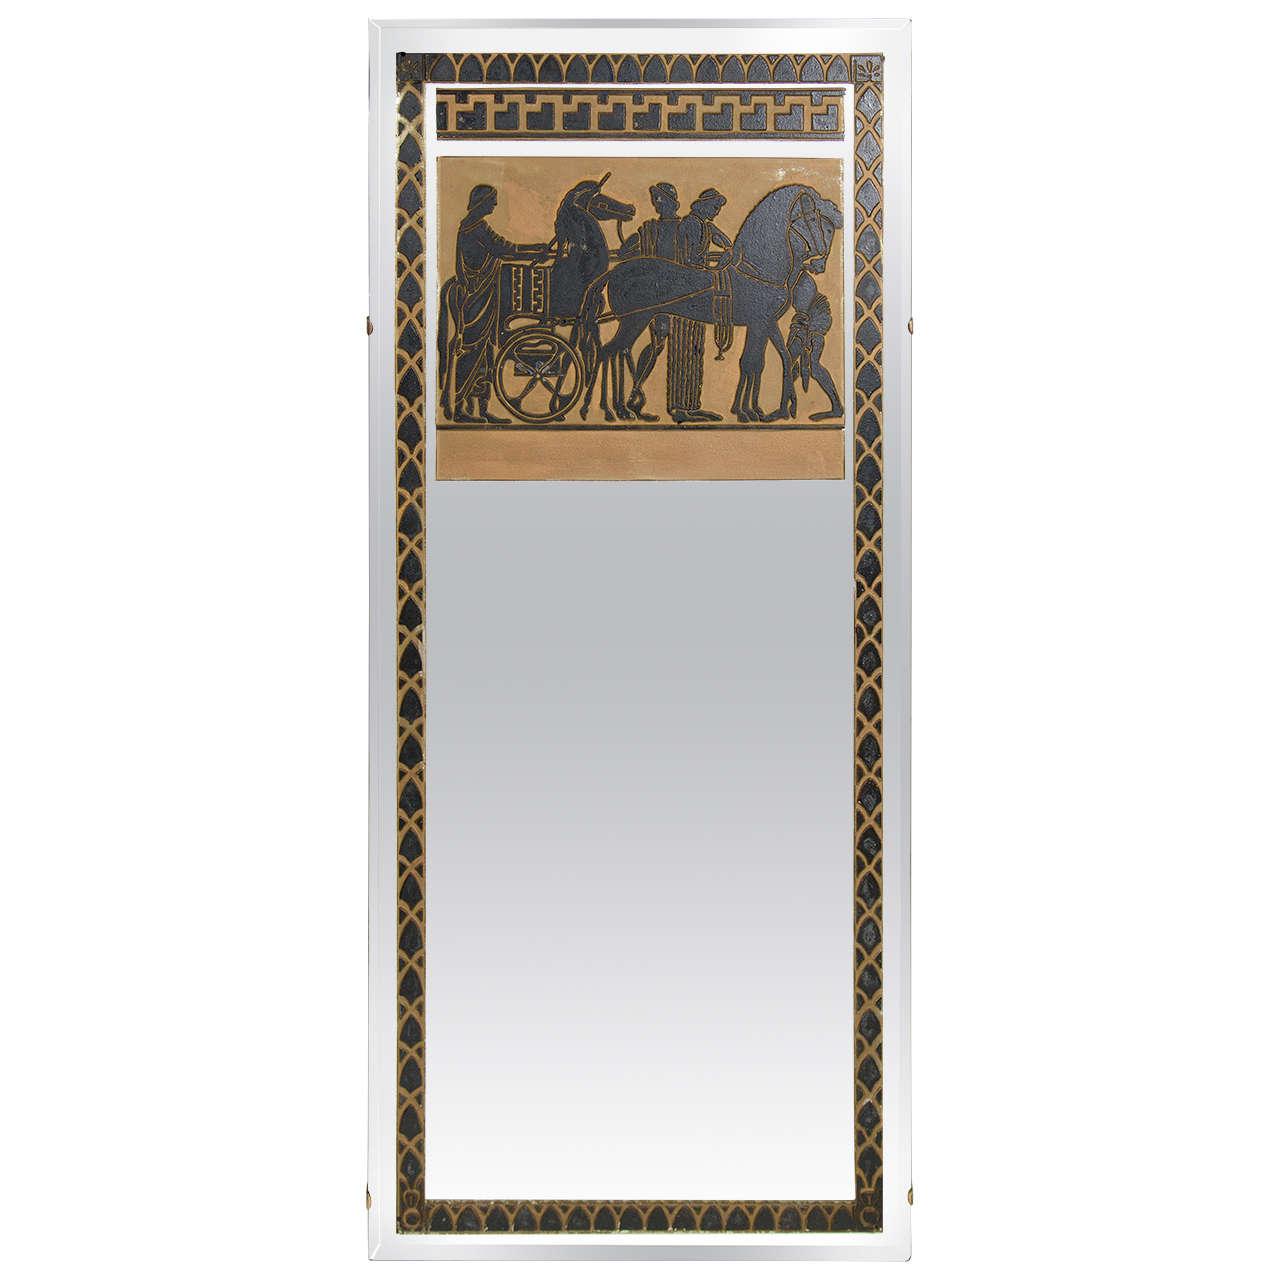 Art deco trumeau mirror with ancient greek scene for sale at 1stdibs art deco trumeau mirror with ancient greek scene for sale jeuxipadfo Gallery